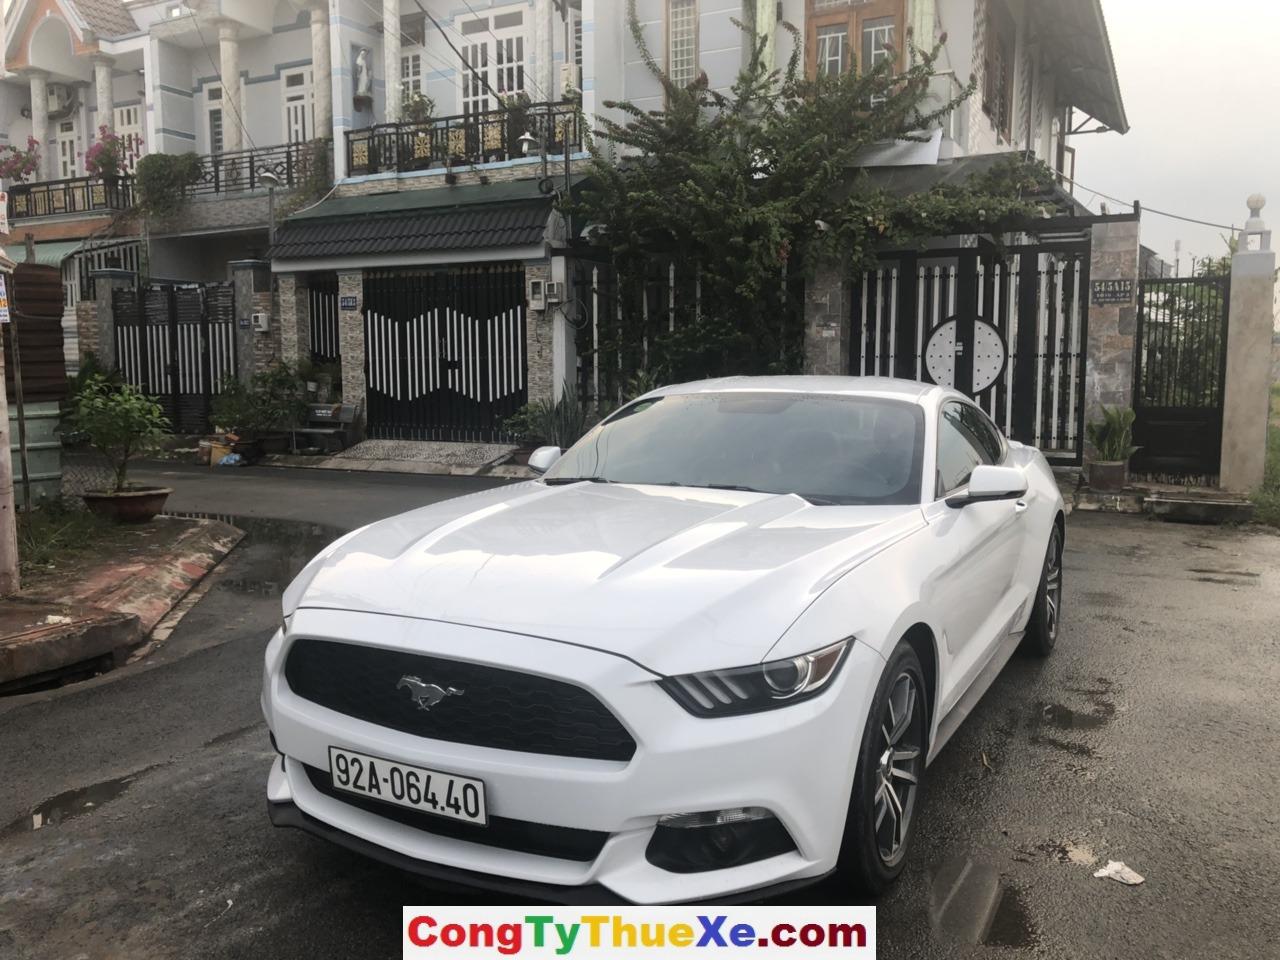 Thuê xe hoa Ford Mustang